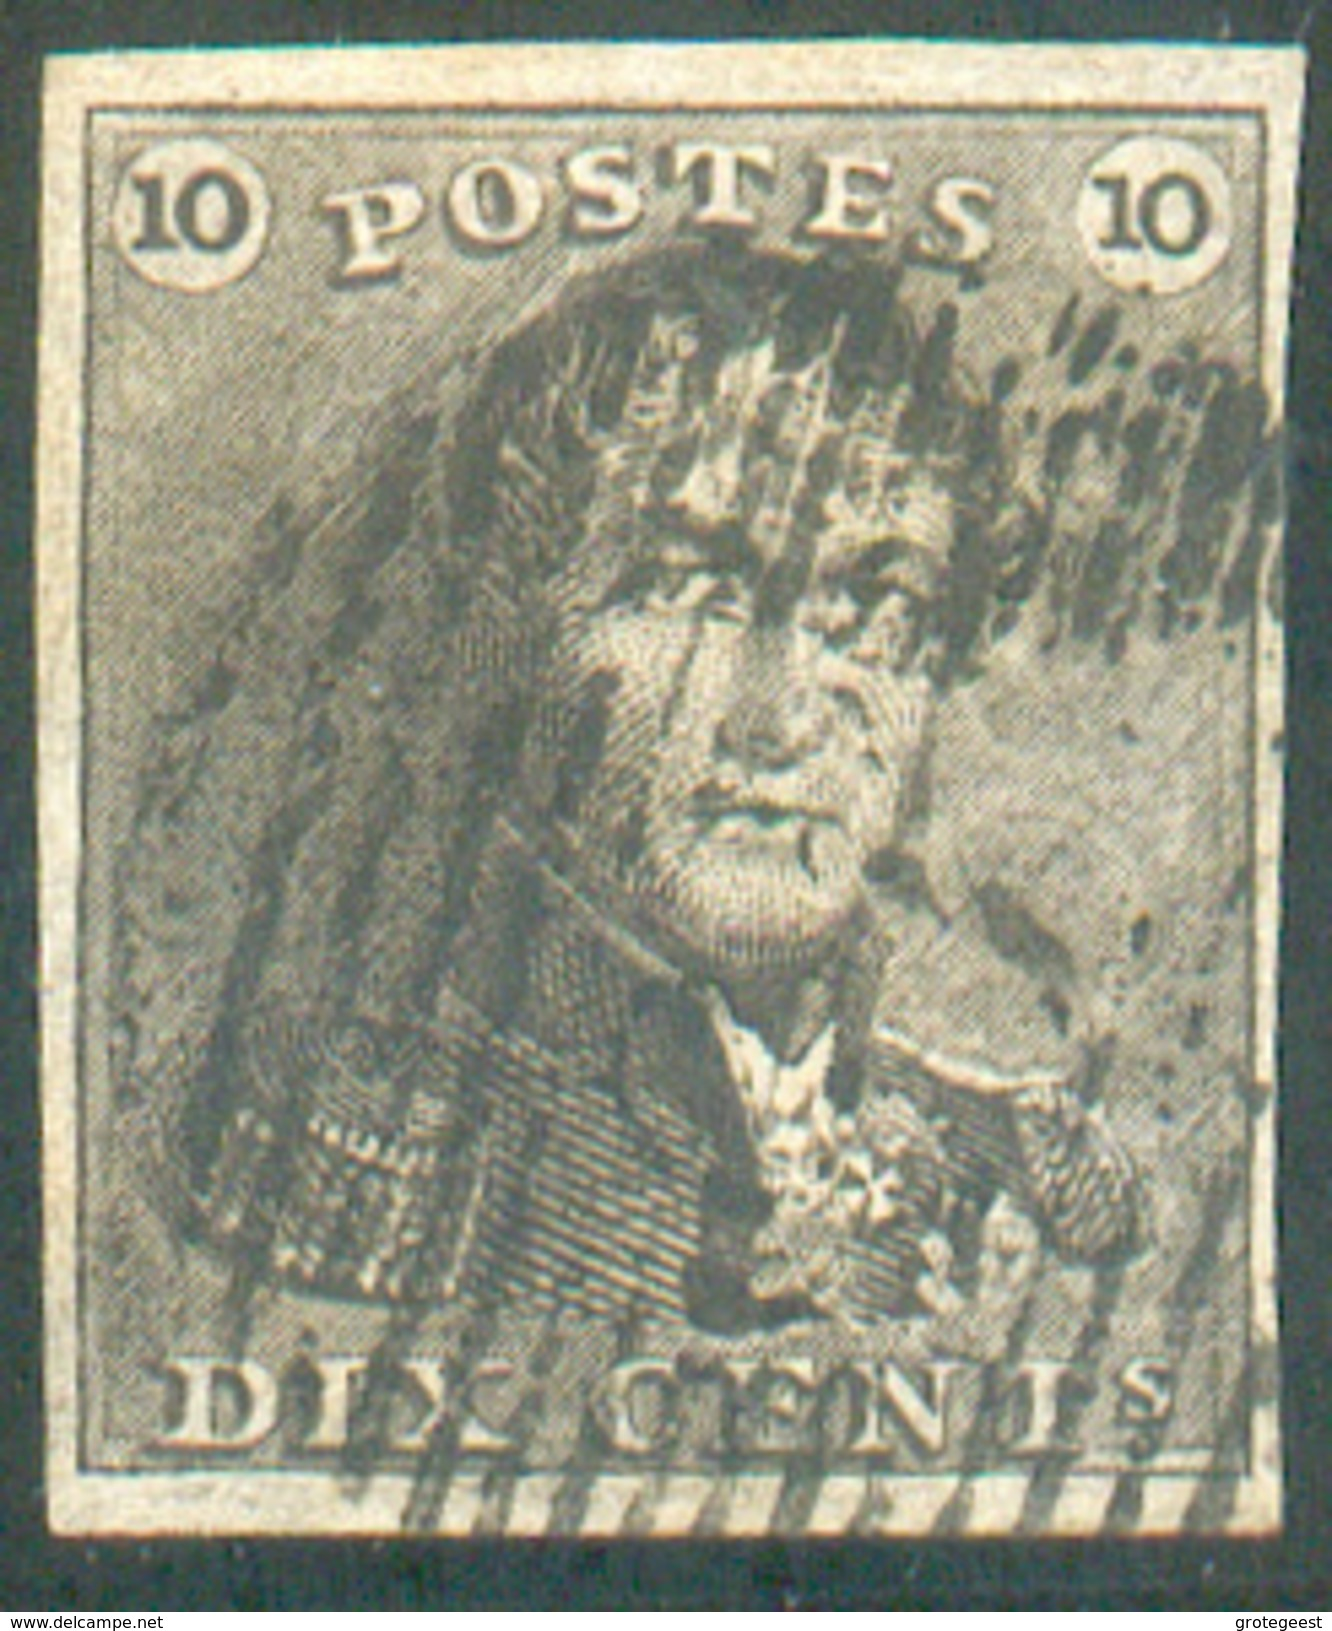 N°1 - Epaulette 10 Centimes Brun, TB Margée Et Léger Pli Accordéon .   - 11597 - 1849 Epaulettes